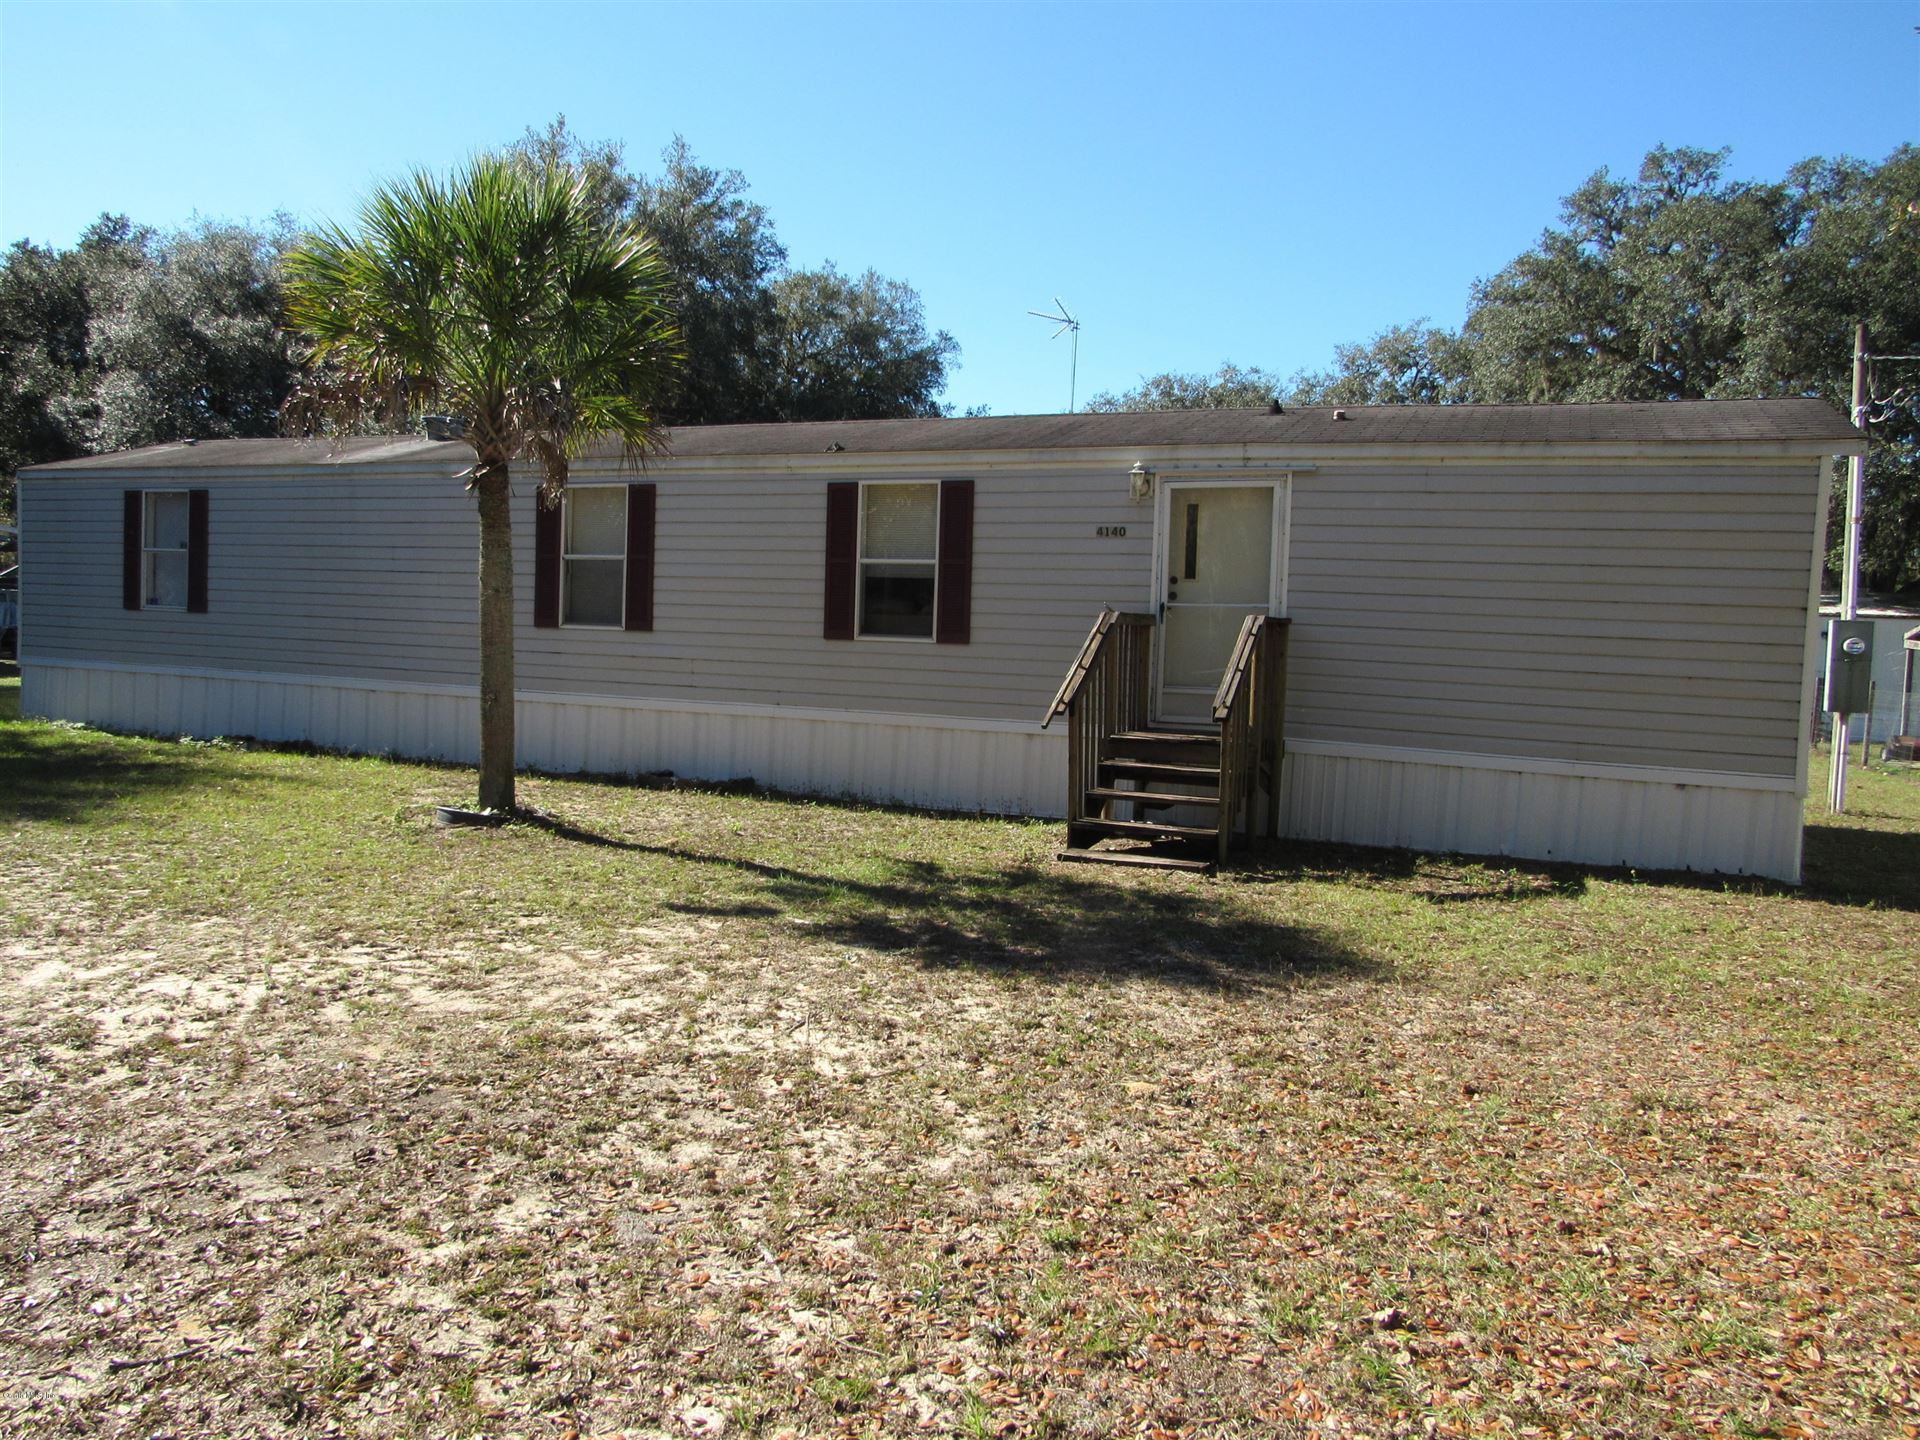 4140 NE 172nd Court, Silver Springs, FL 34488 - MLS#: 568549